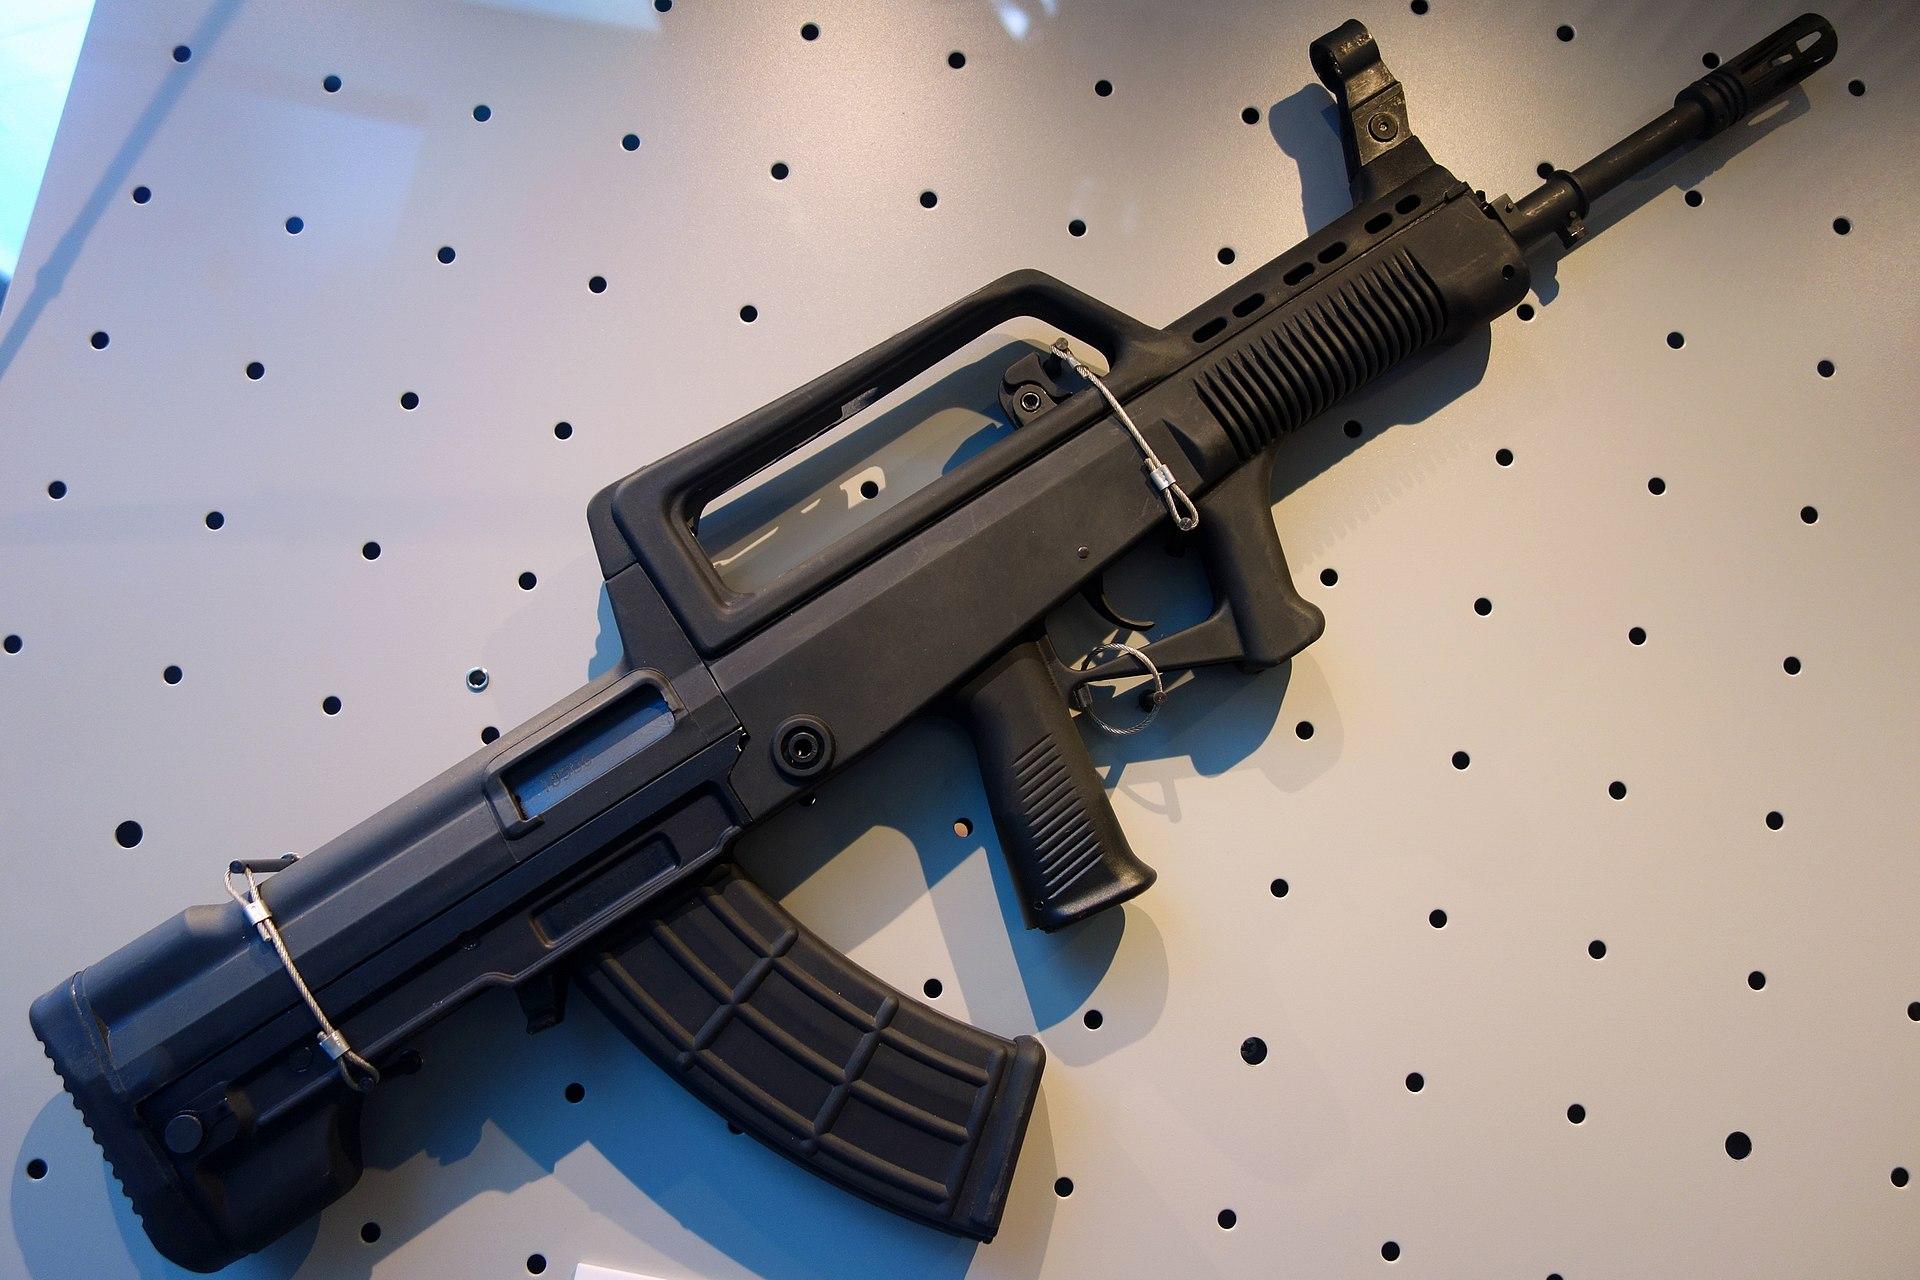 https://upload.wikimedia.org/wikipedia/commons/thumb/0/0e/QBZ95_automatic_rifle_20170902.jpg/1920px-QBZ95_automatic_rifle_20170902.jpg